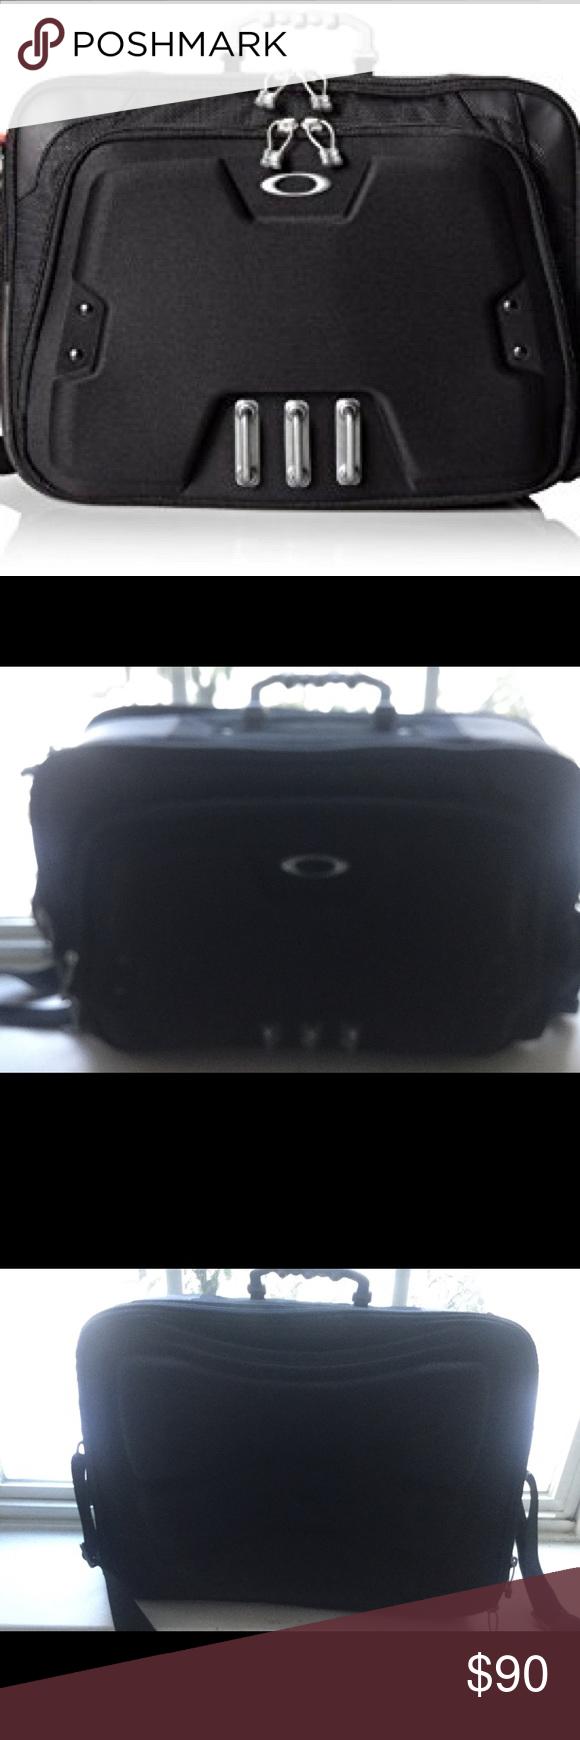 oakley mens computer bag lap top casebriefcase